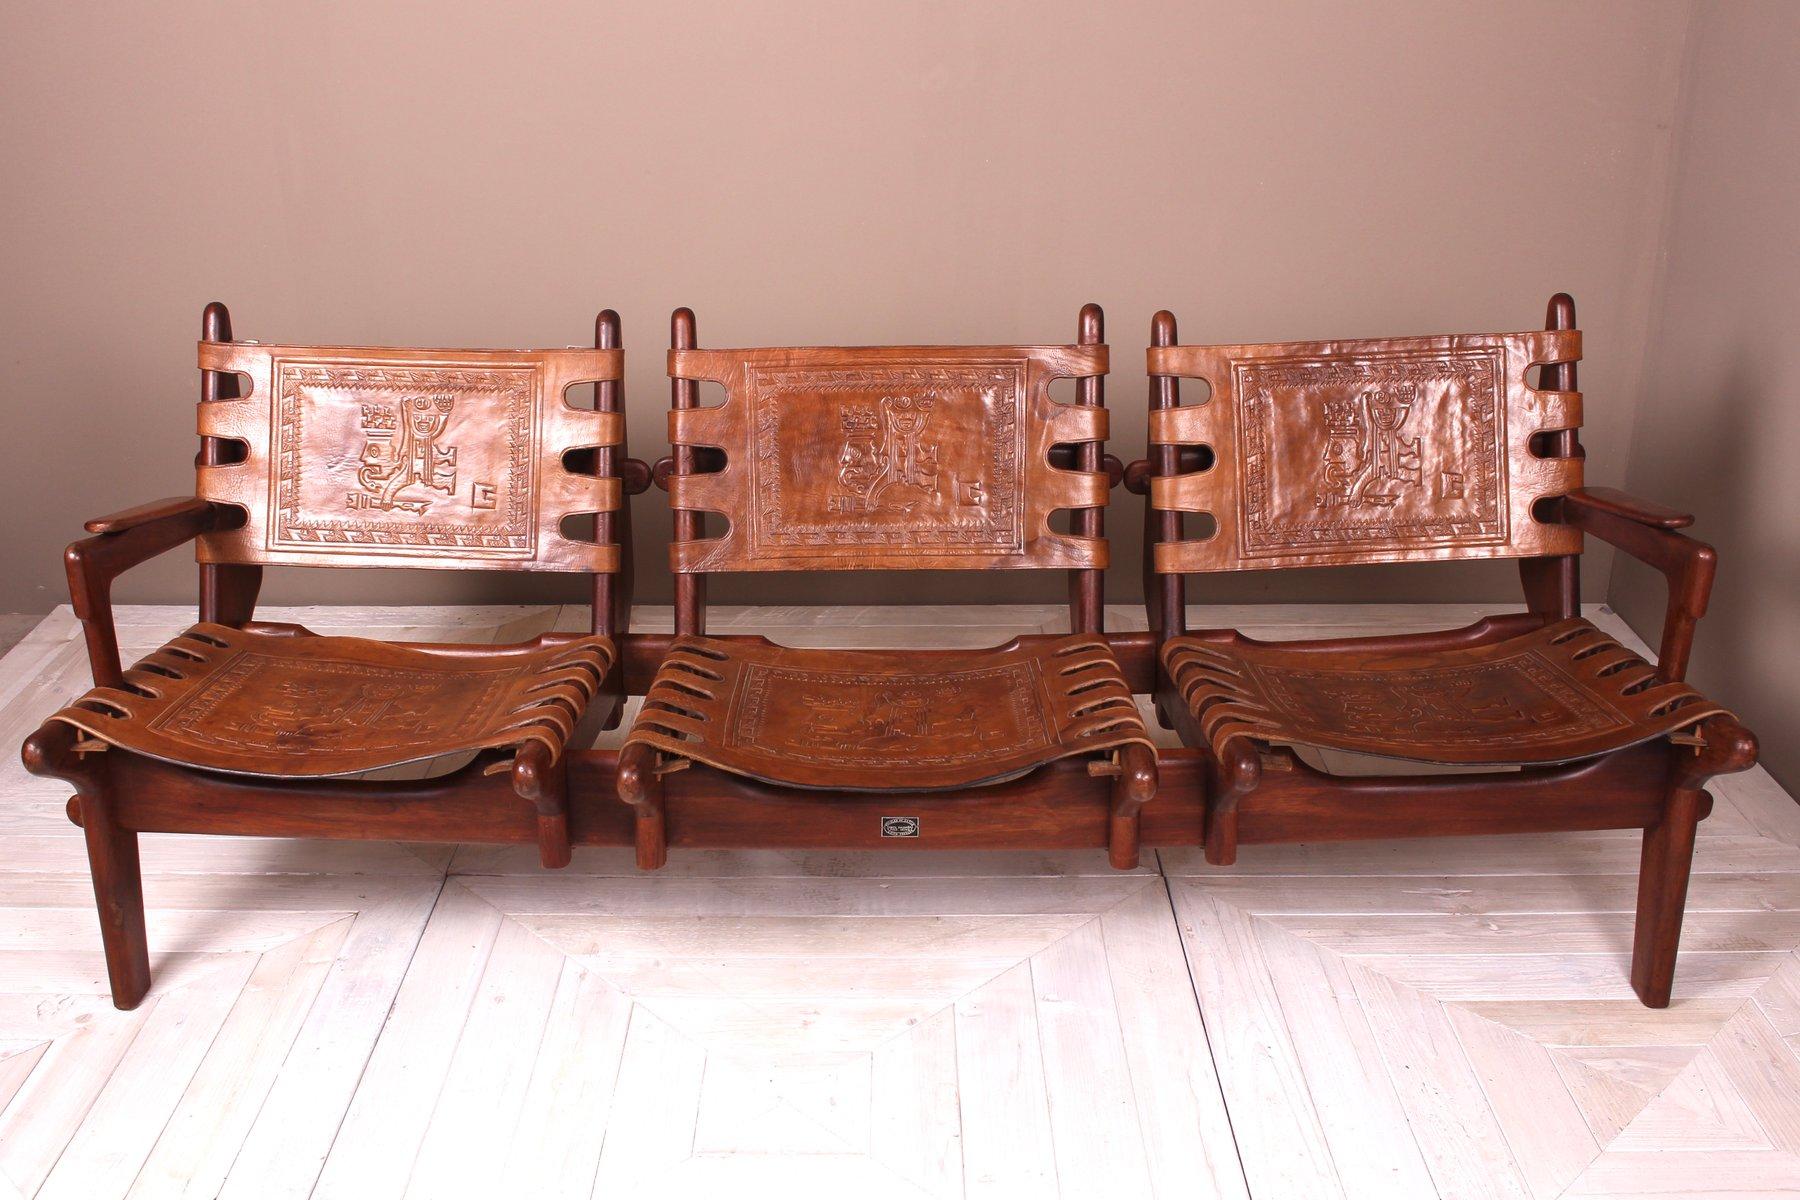 Ecuadorian Rosewood Leather Three Seater Sofa By Angel I Pazmino For Muebles De Estilo 1960s